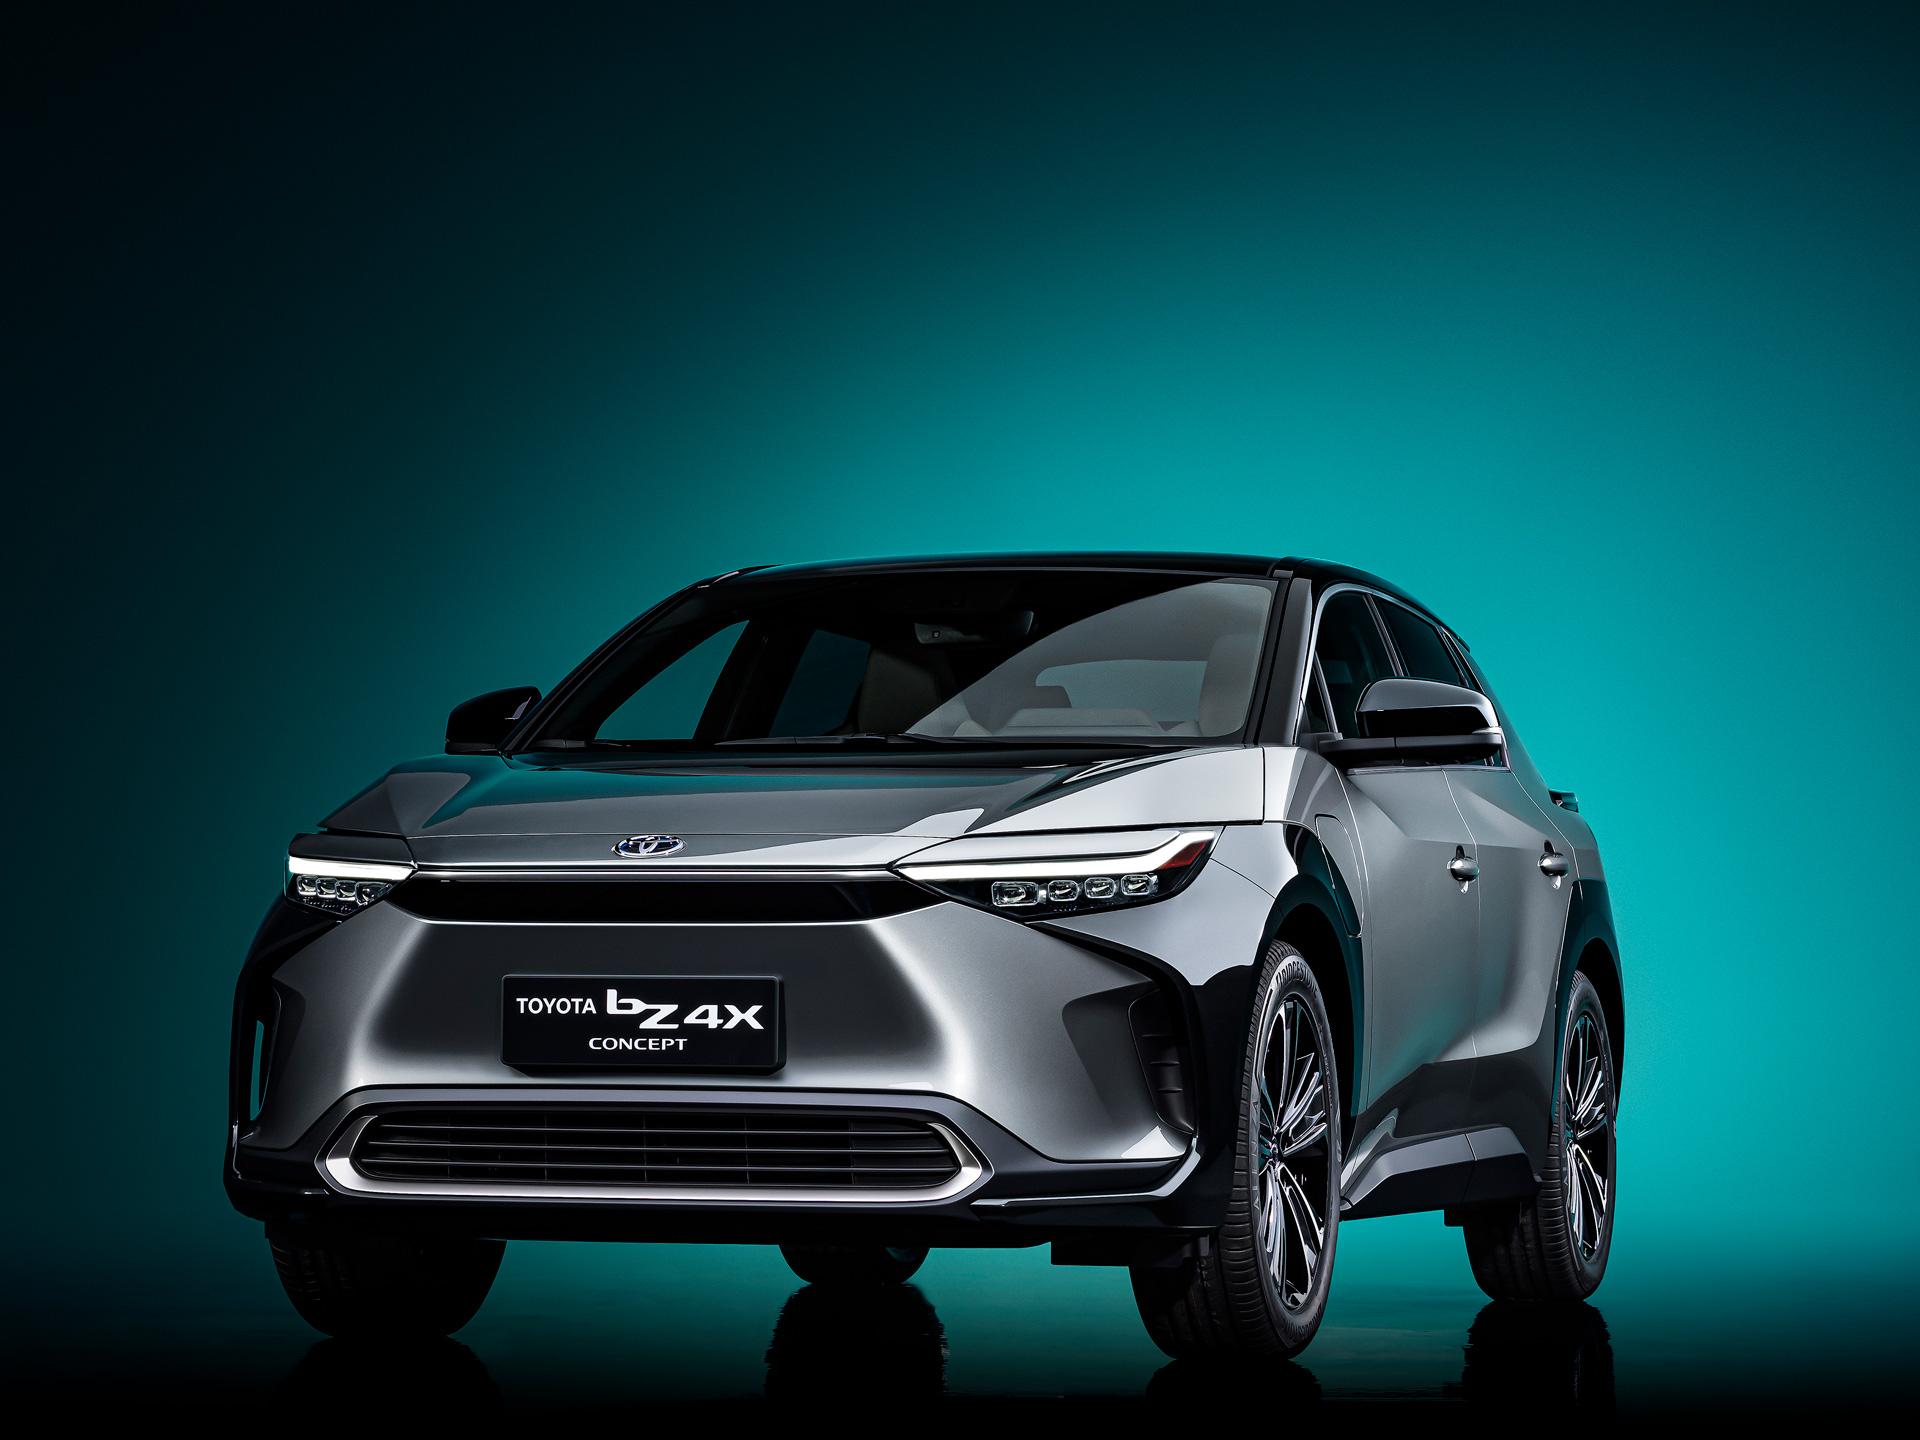 Toyota презентовала «электрический RAV4» bZ4X на автосалоне в Шанхае